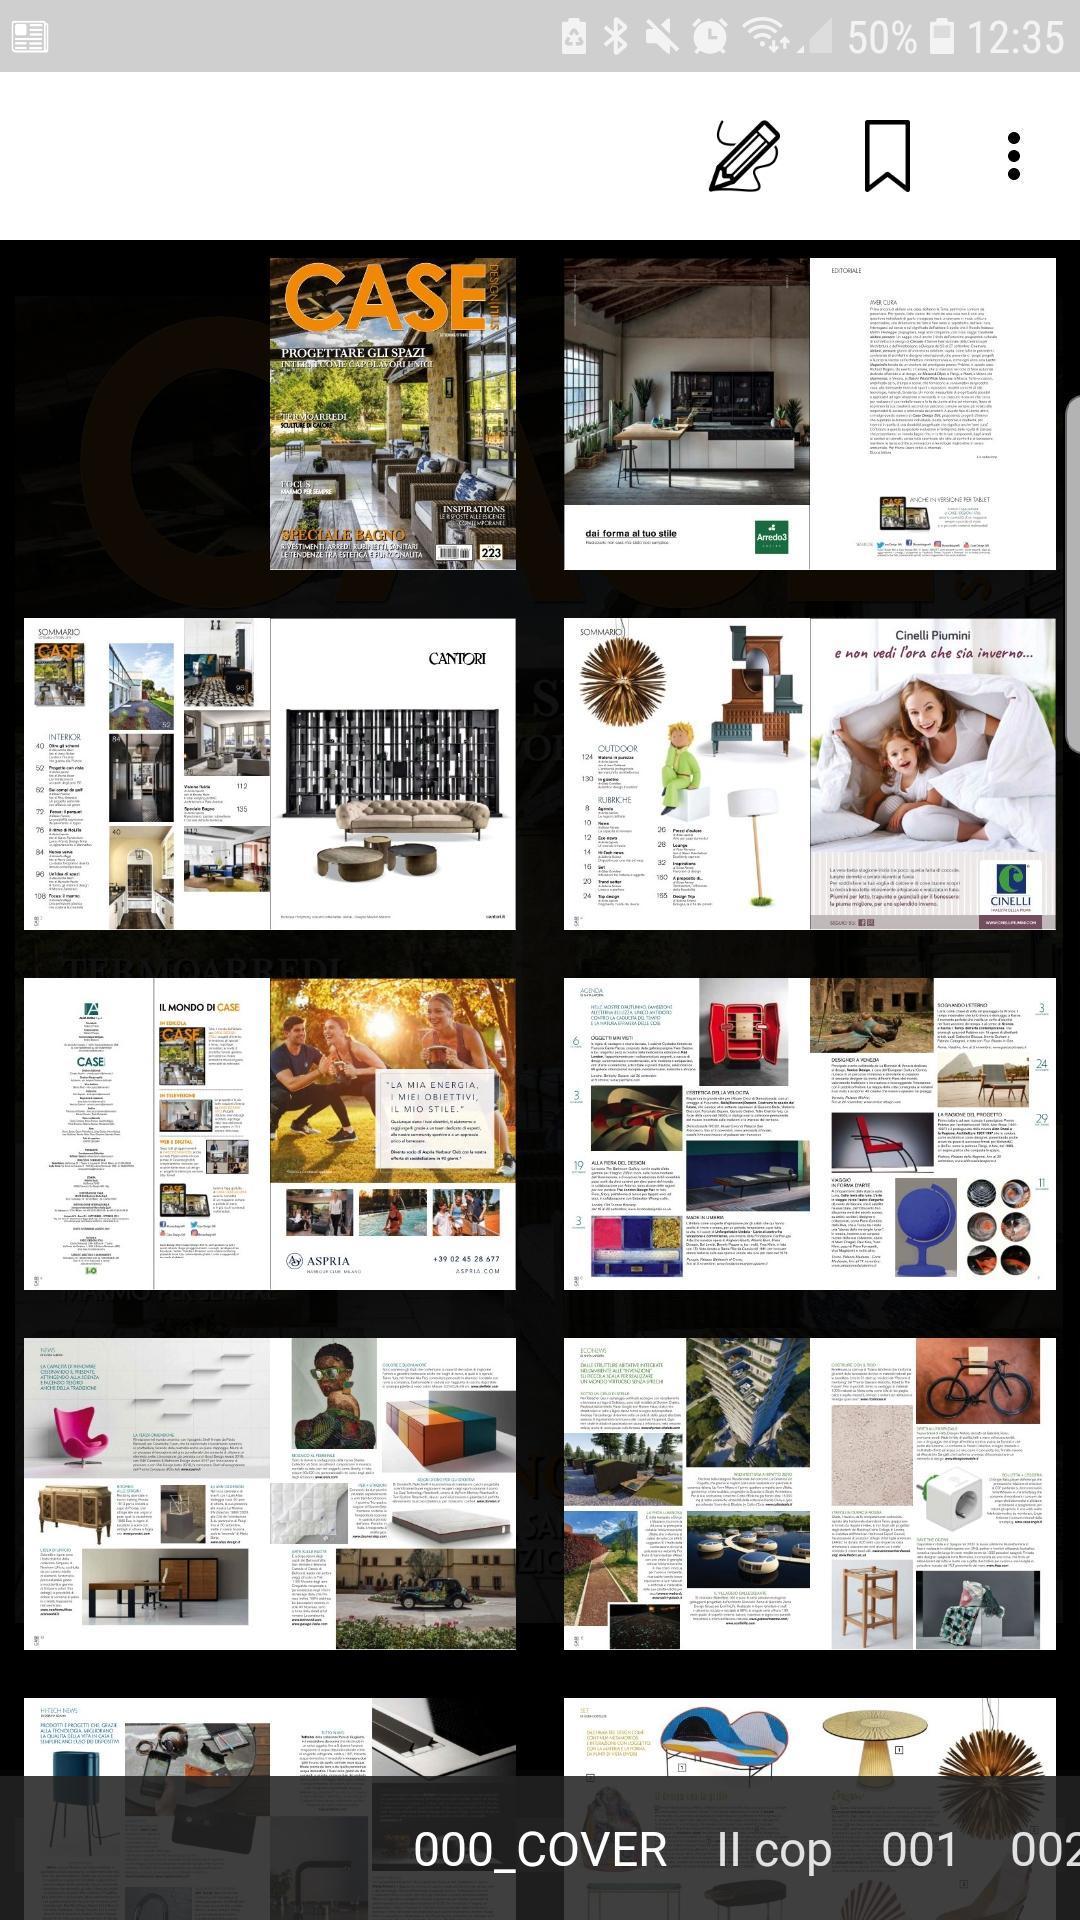 Case E Stili Design case design stili for android - apk download